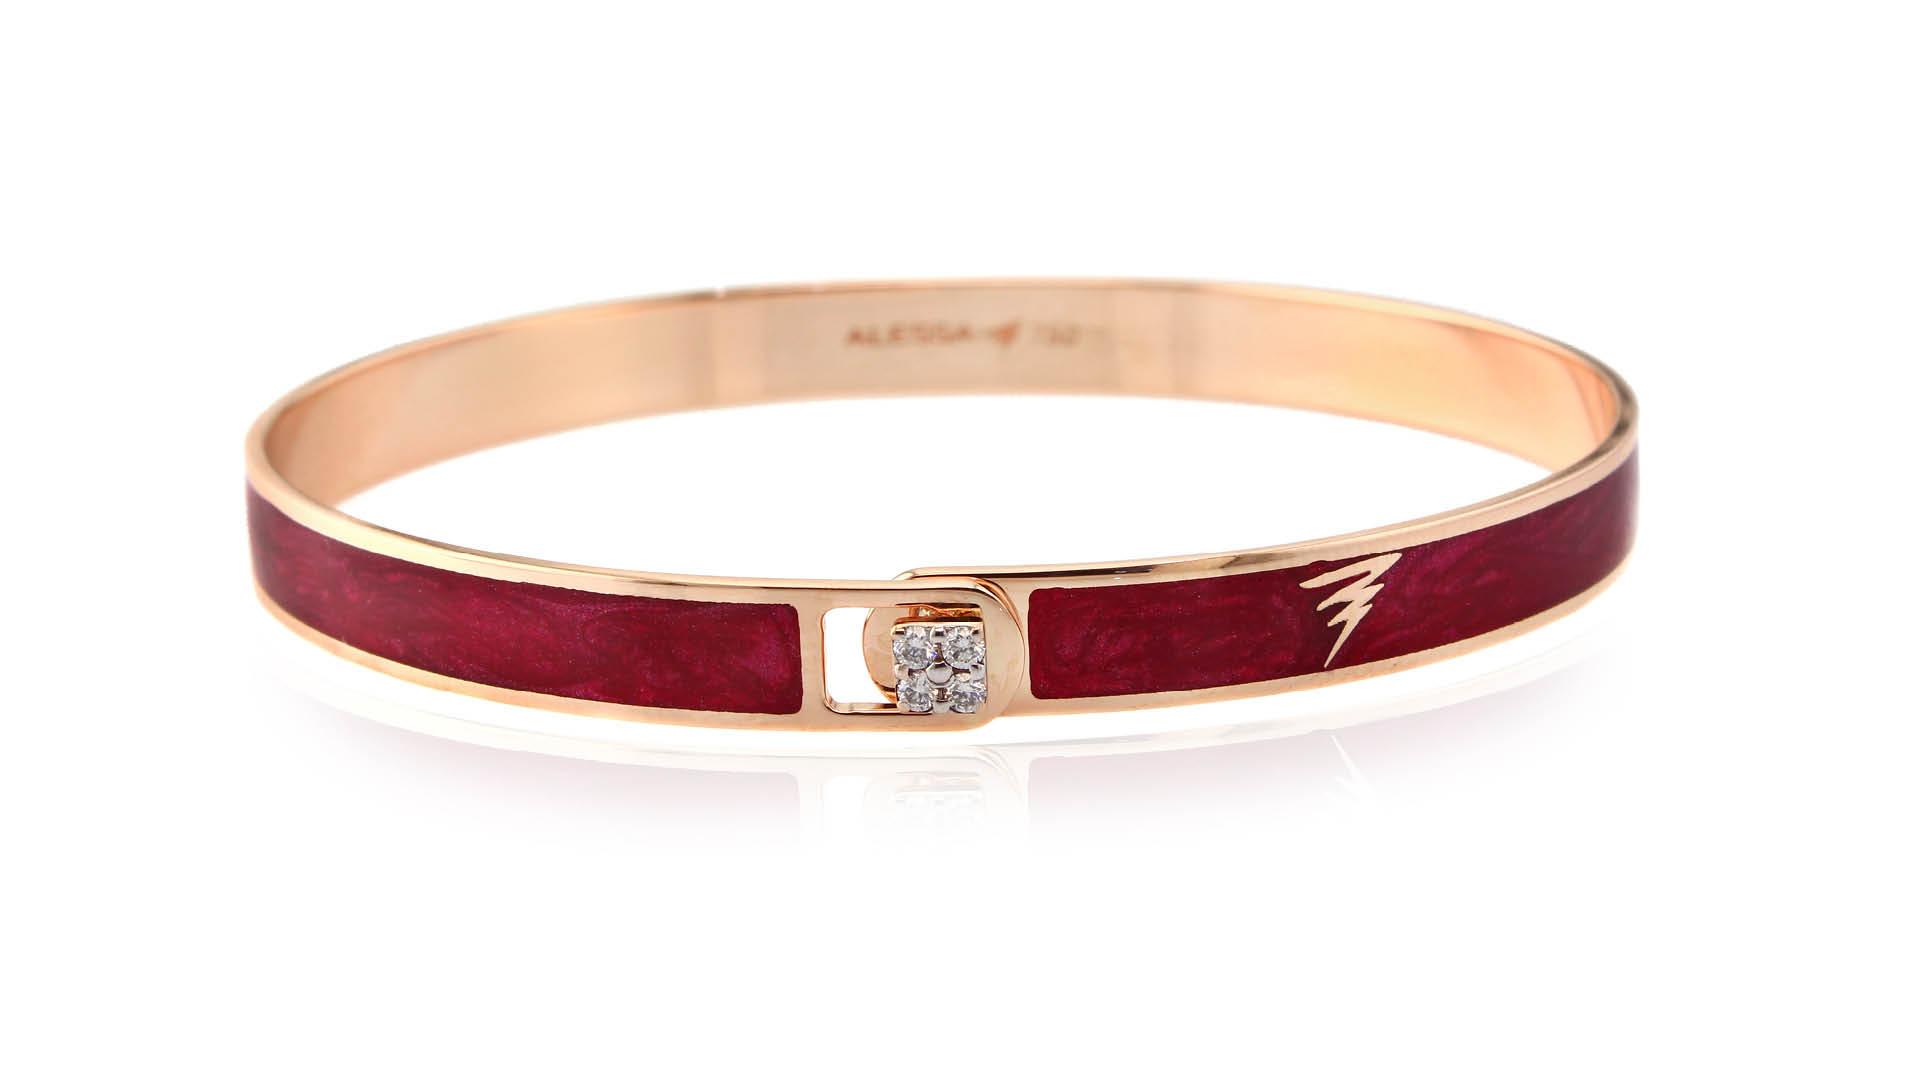 Alessa-Jewelry-Spectrum-Impressions-Bangle